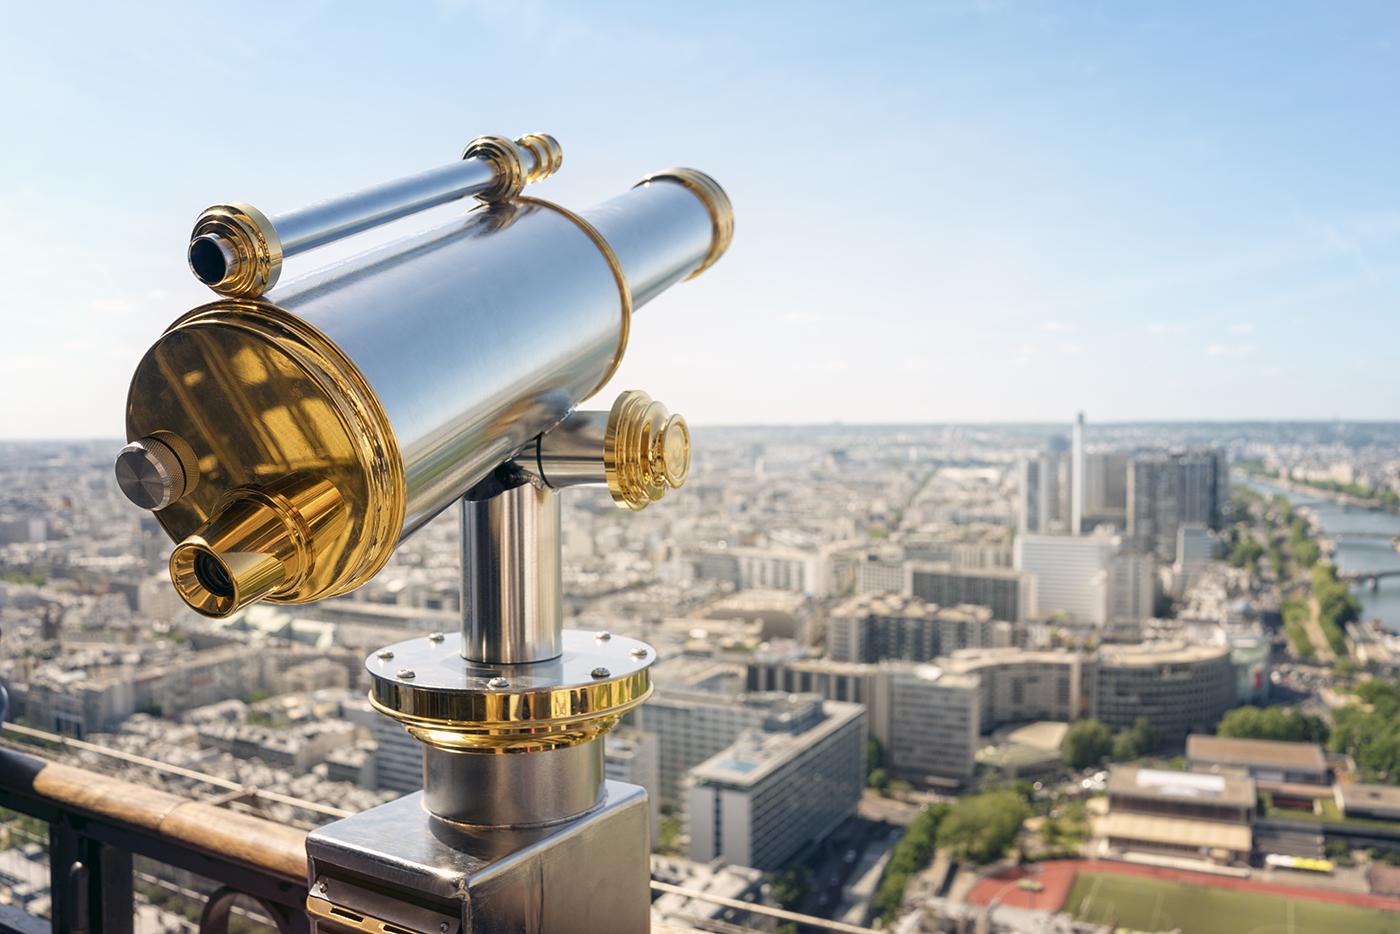 5.14.19_tourist-telescope-on-eiffel-tower-paris-6Z7LQTN.jpg